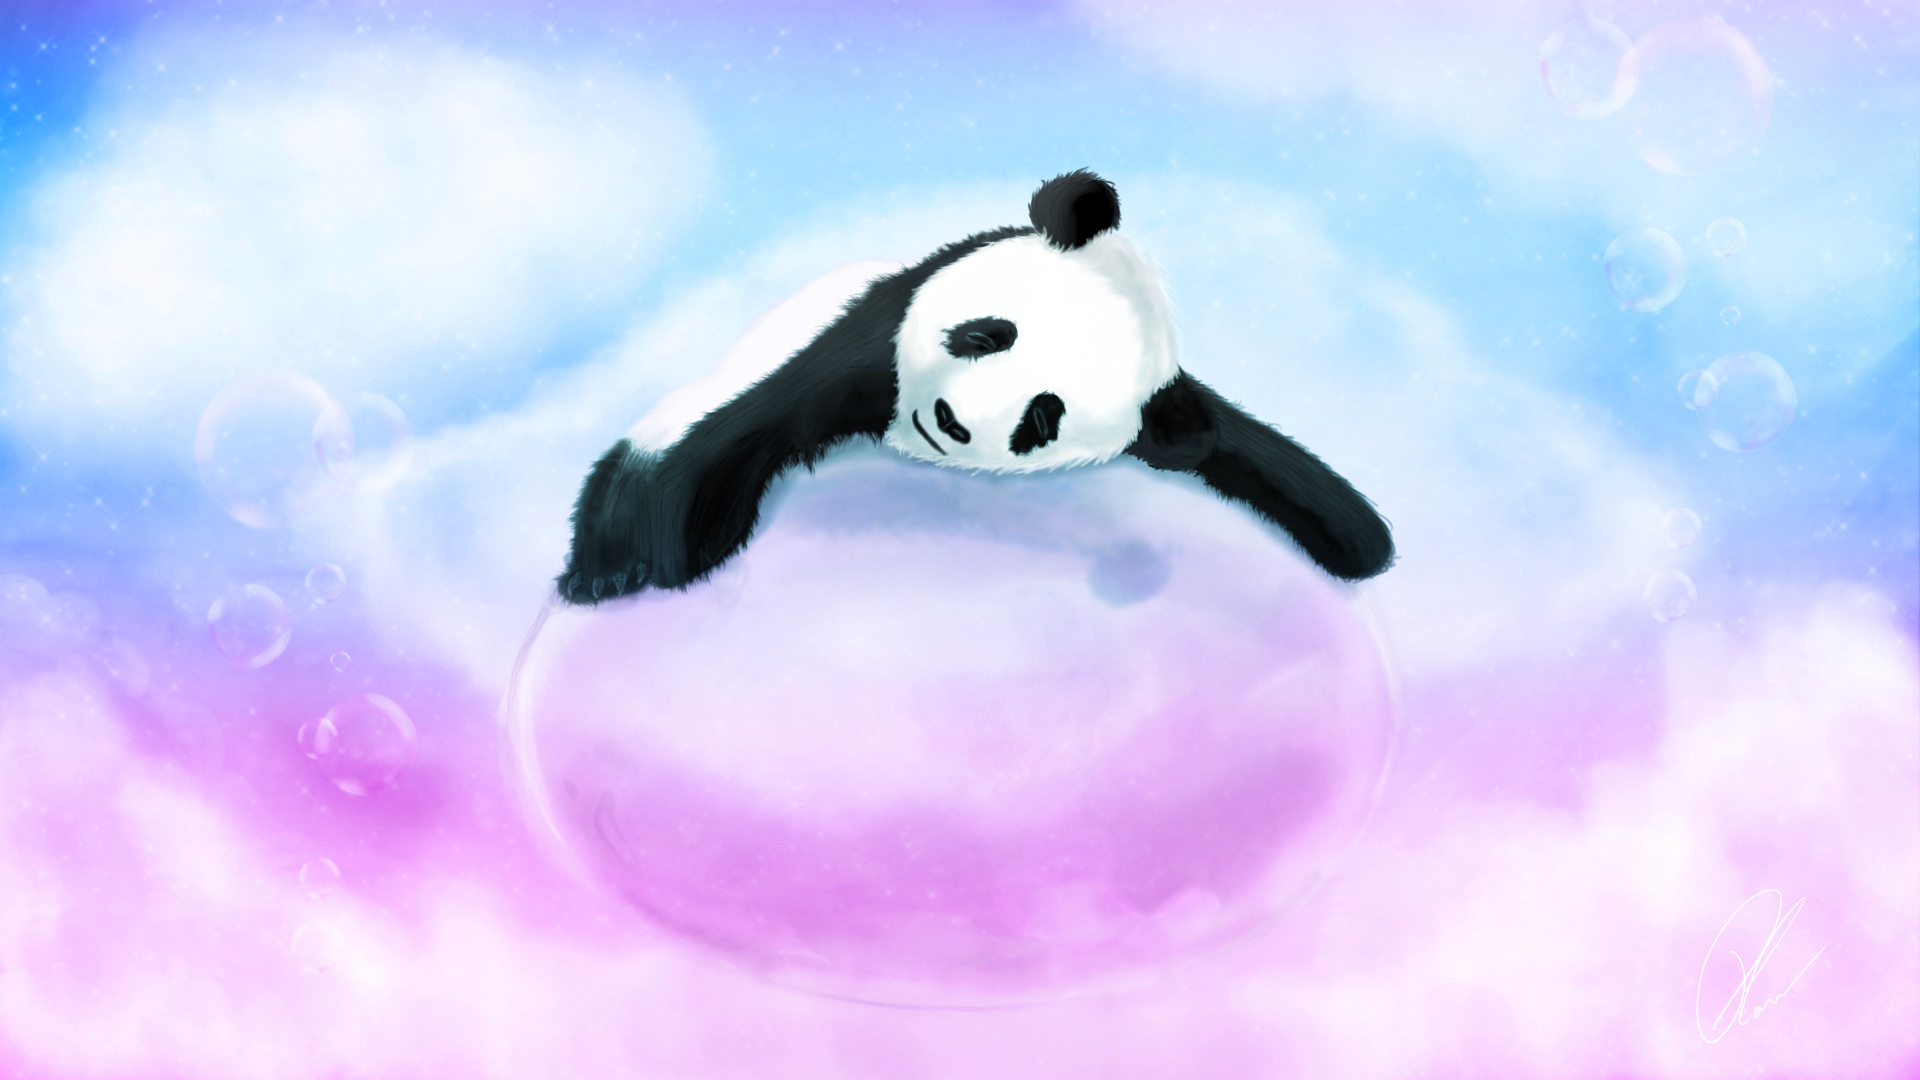 Panda full hd wallpaper and background image 1920x1080 - Panda anime wallpaper ...